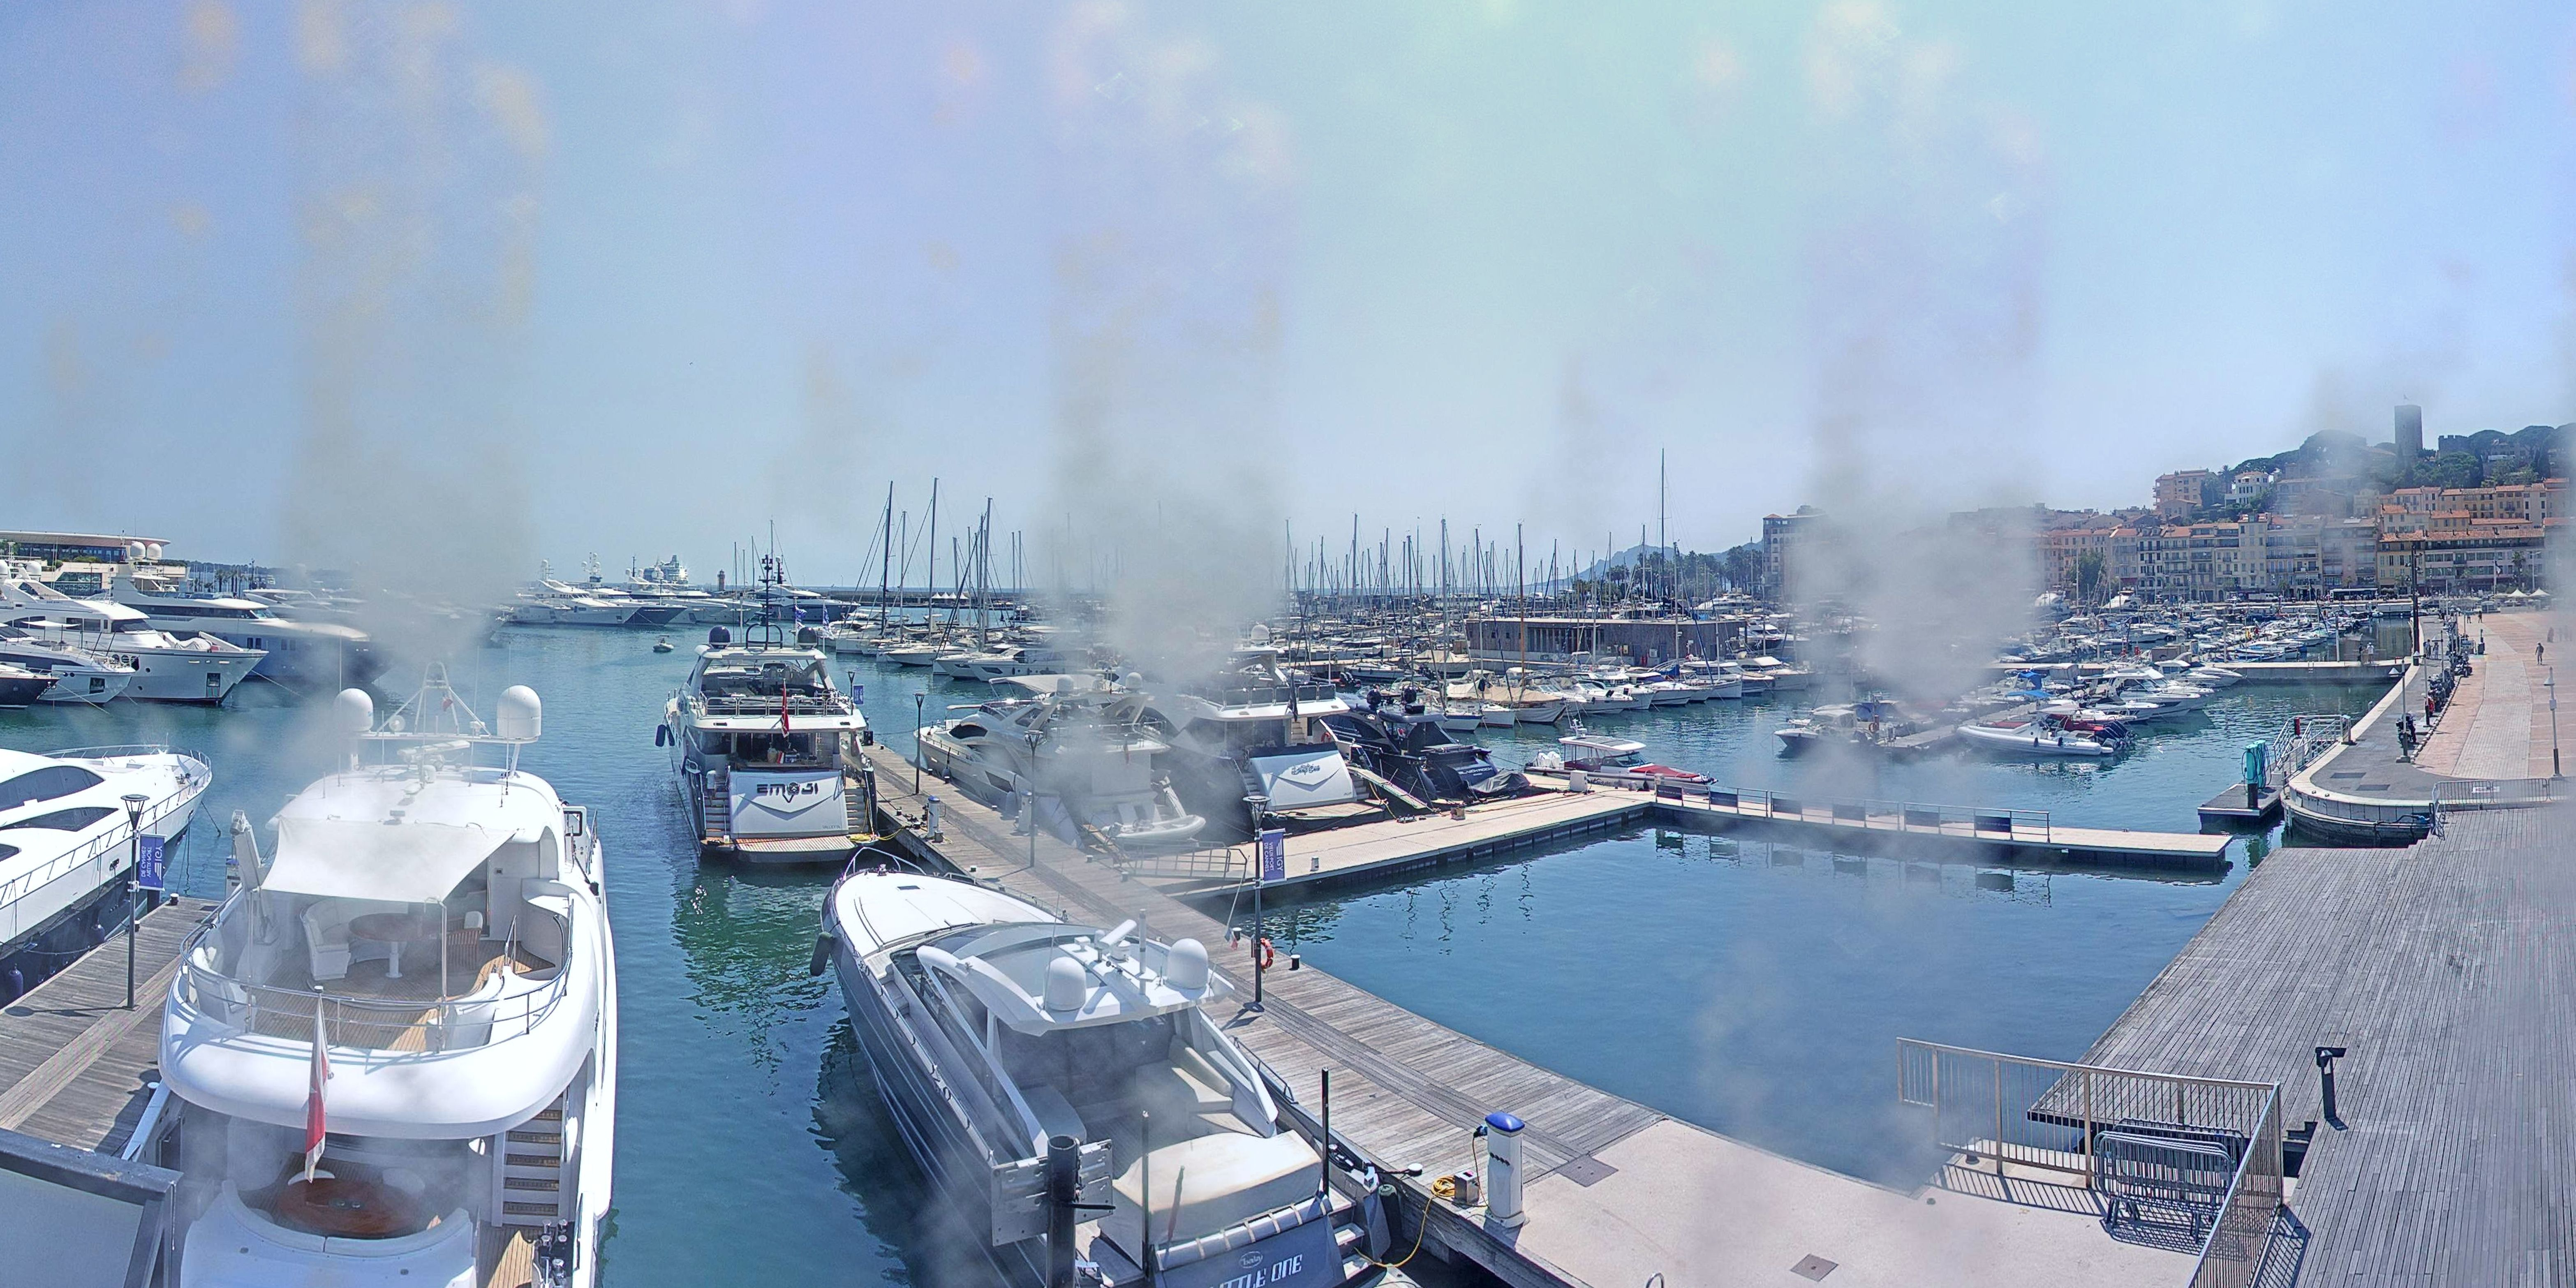 Cannes Thu. 16:35